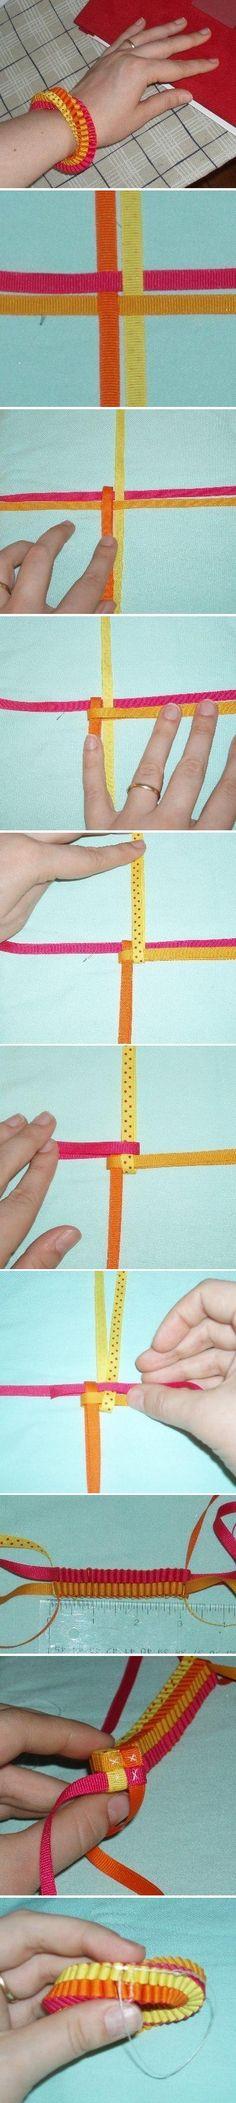 DIY Quick Tape Bracelet